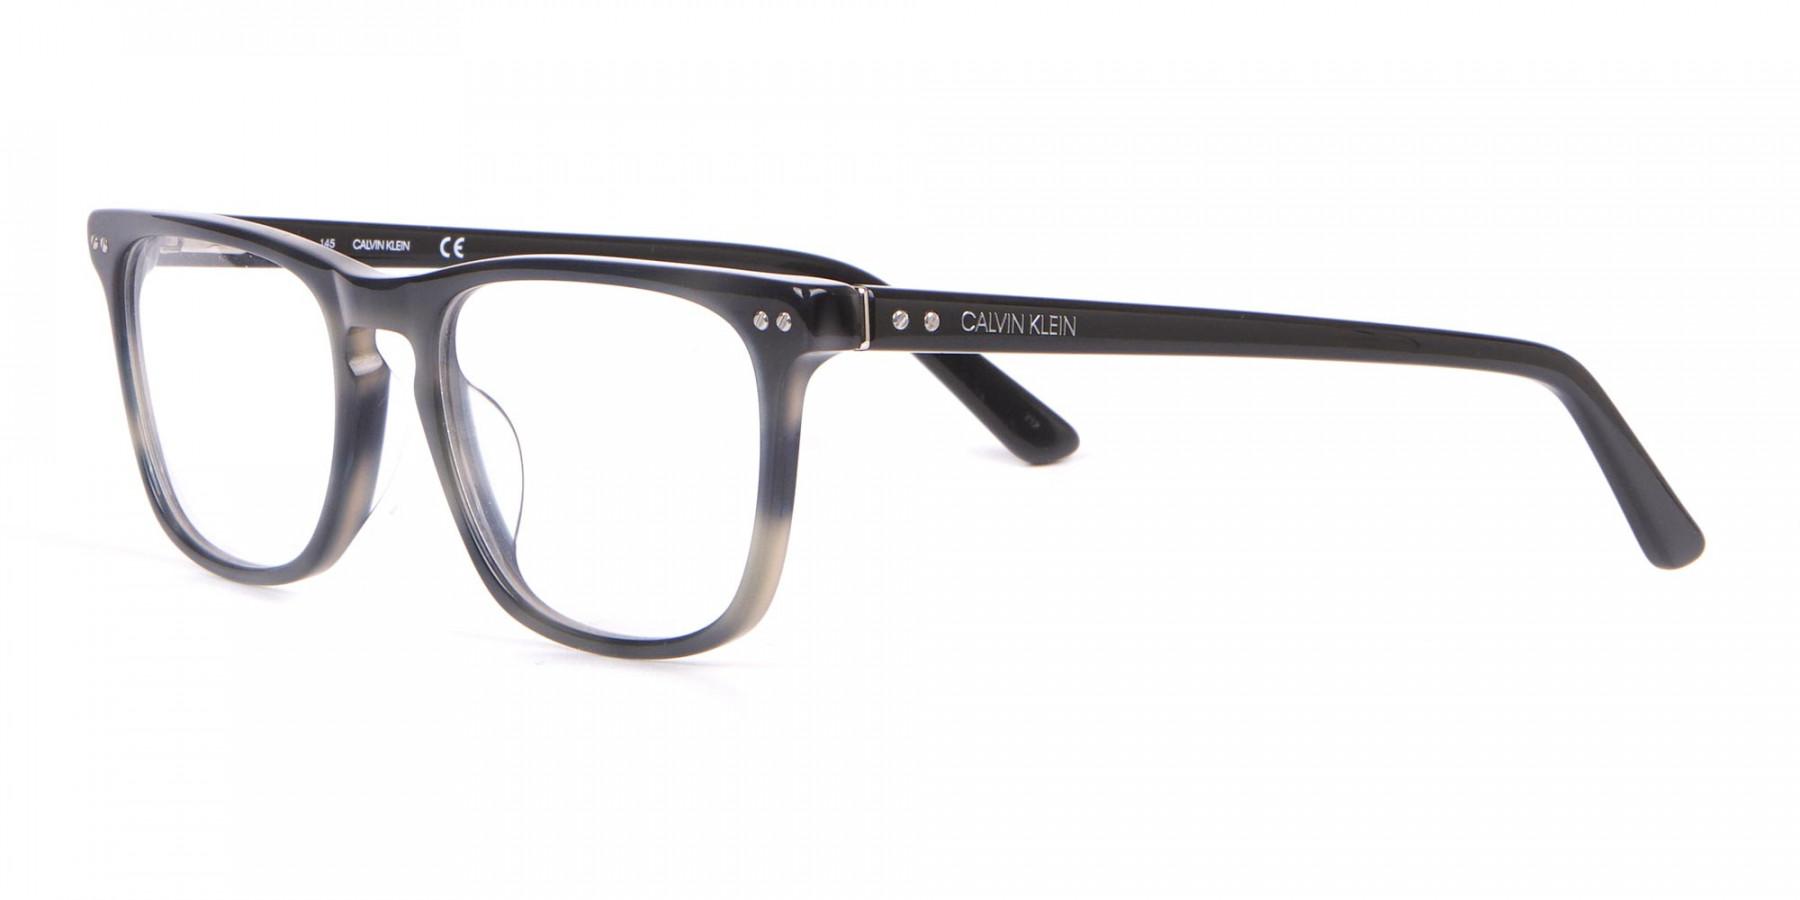 Calvin Klein CK18513 Rectangular Glasses in Grey Tortoise-1